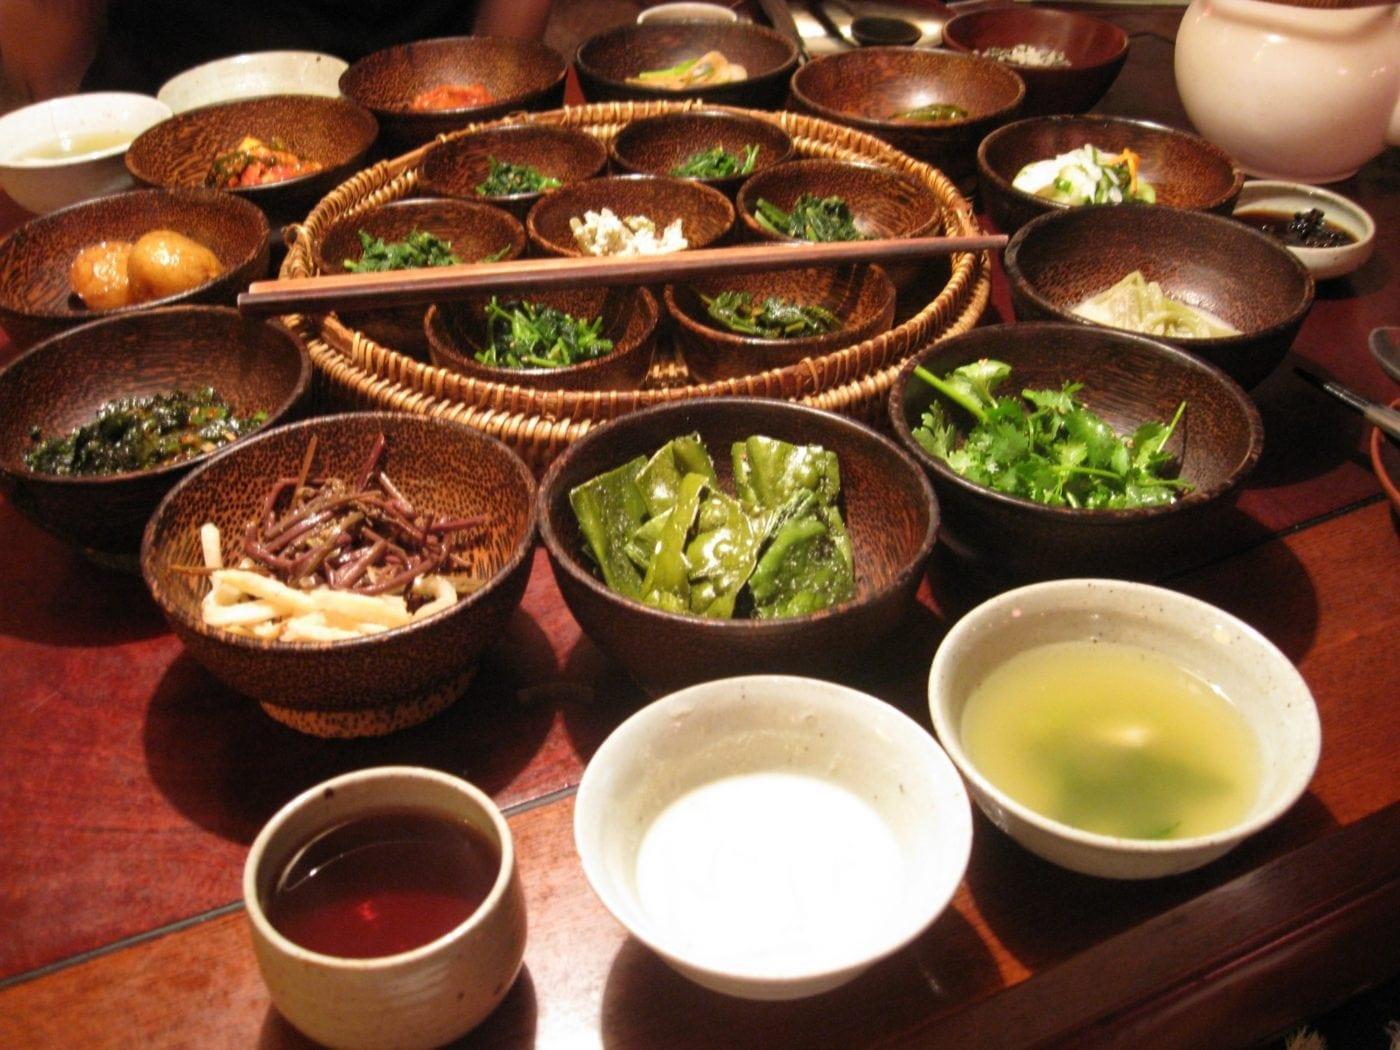 The Best Vegetarian and Vegan Restaurants in Seoul